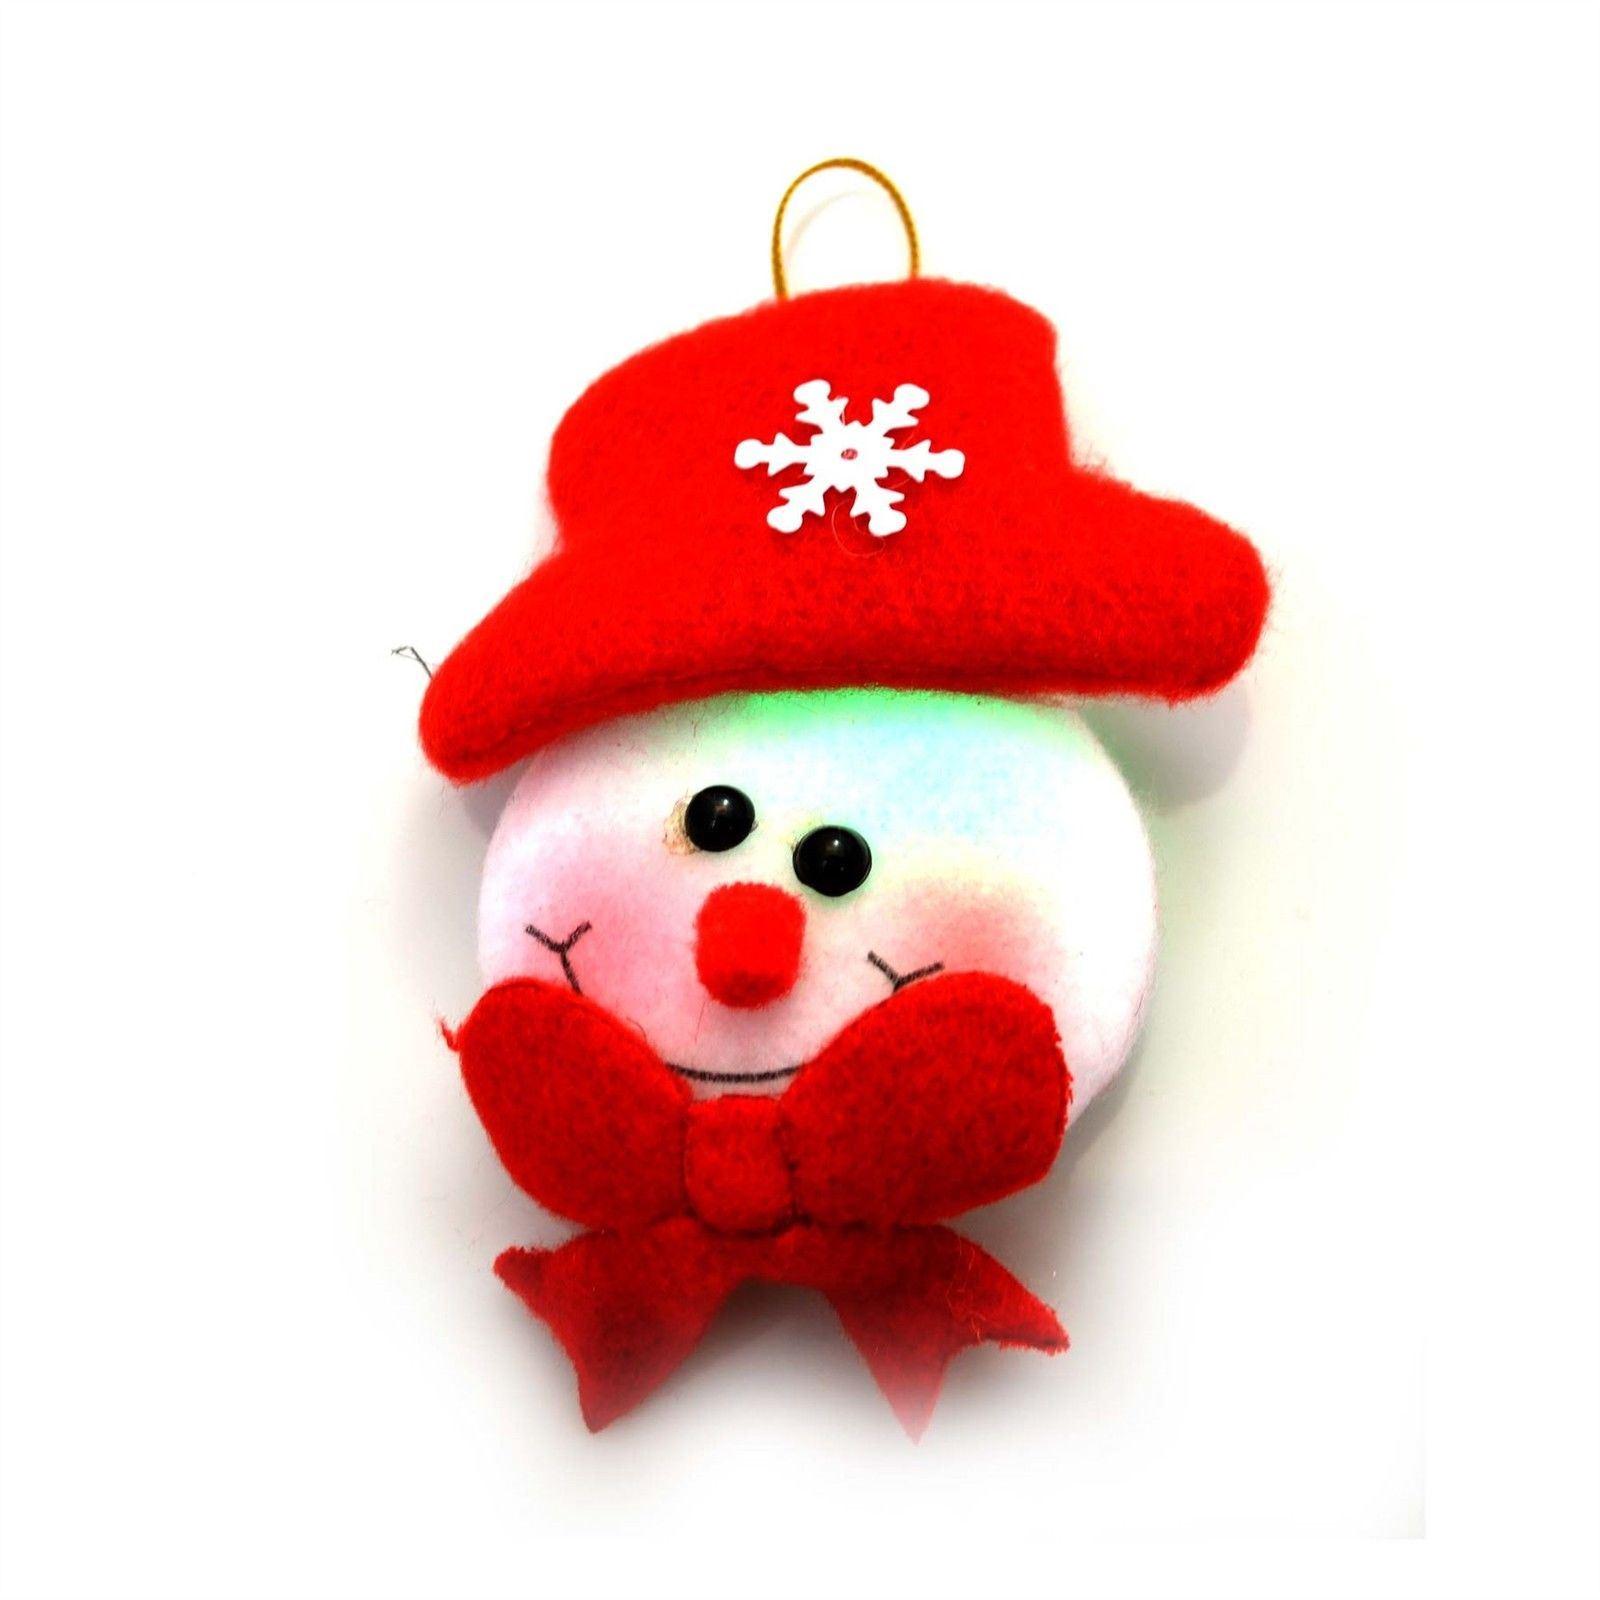 Christmas-Tree-Hanging-Decorations-Glitter-Snowman-Xmas-Beads-Chain-Garland thumbnail 16